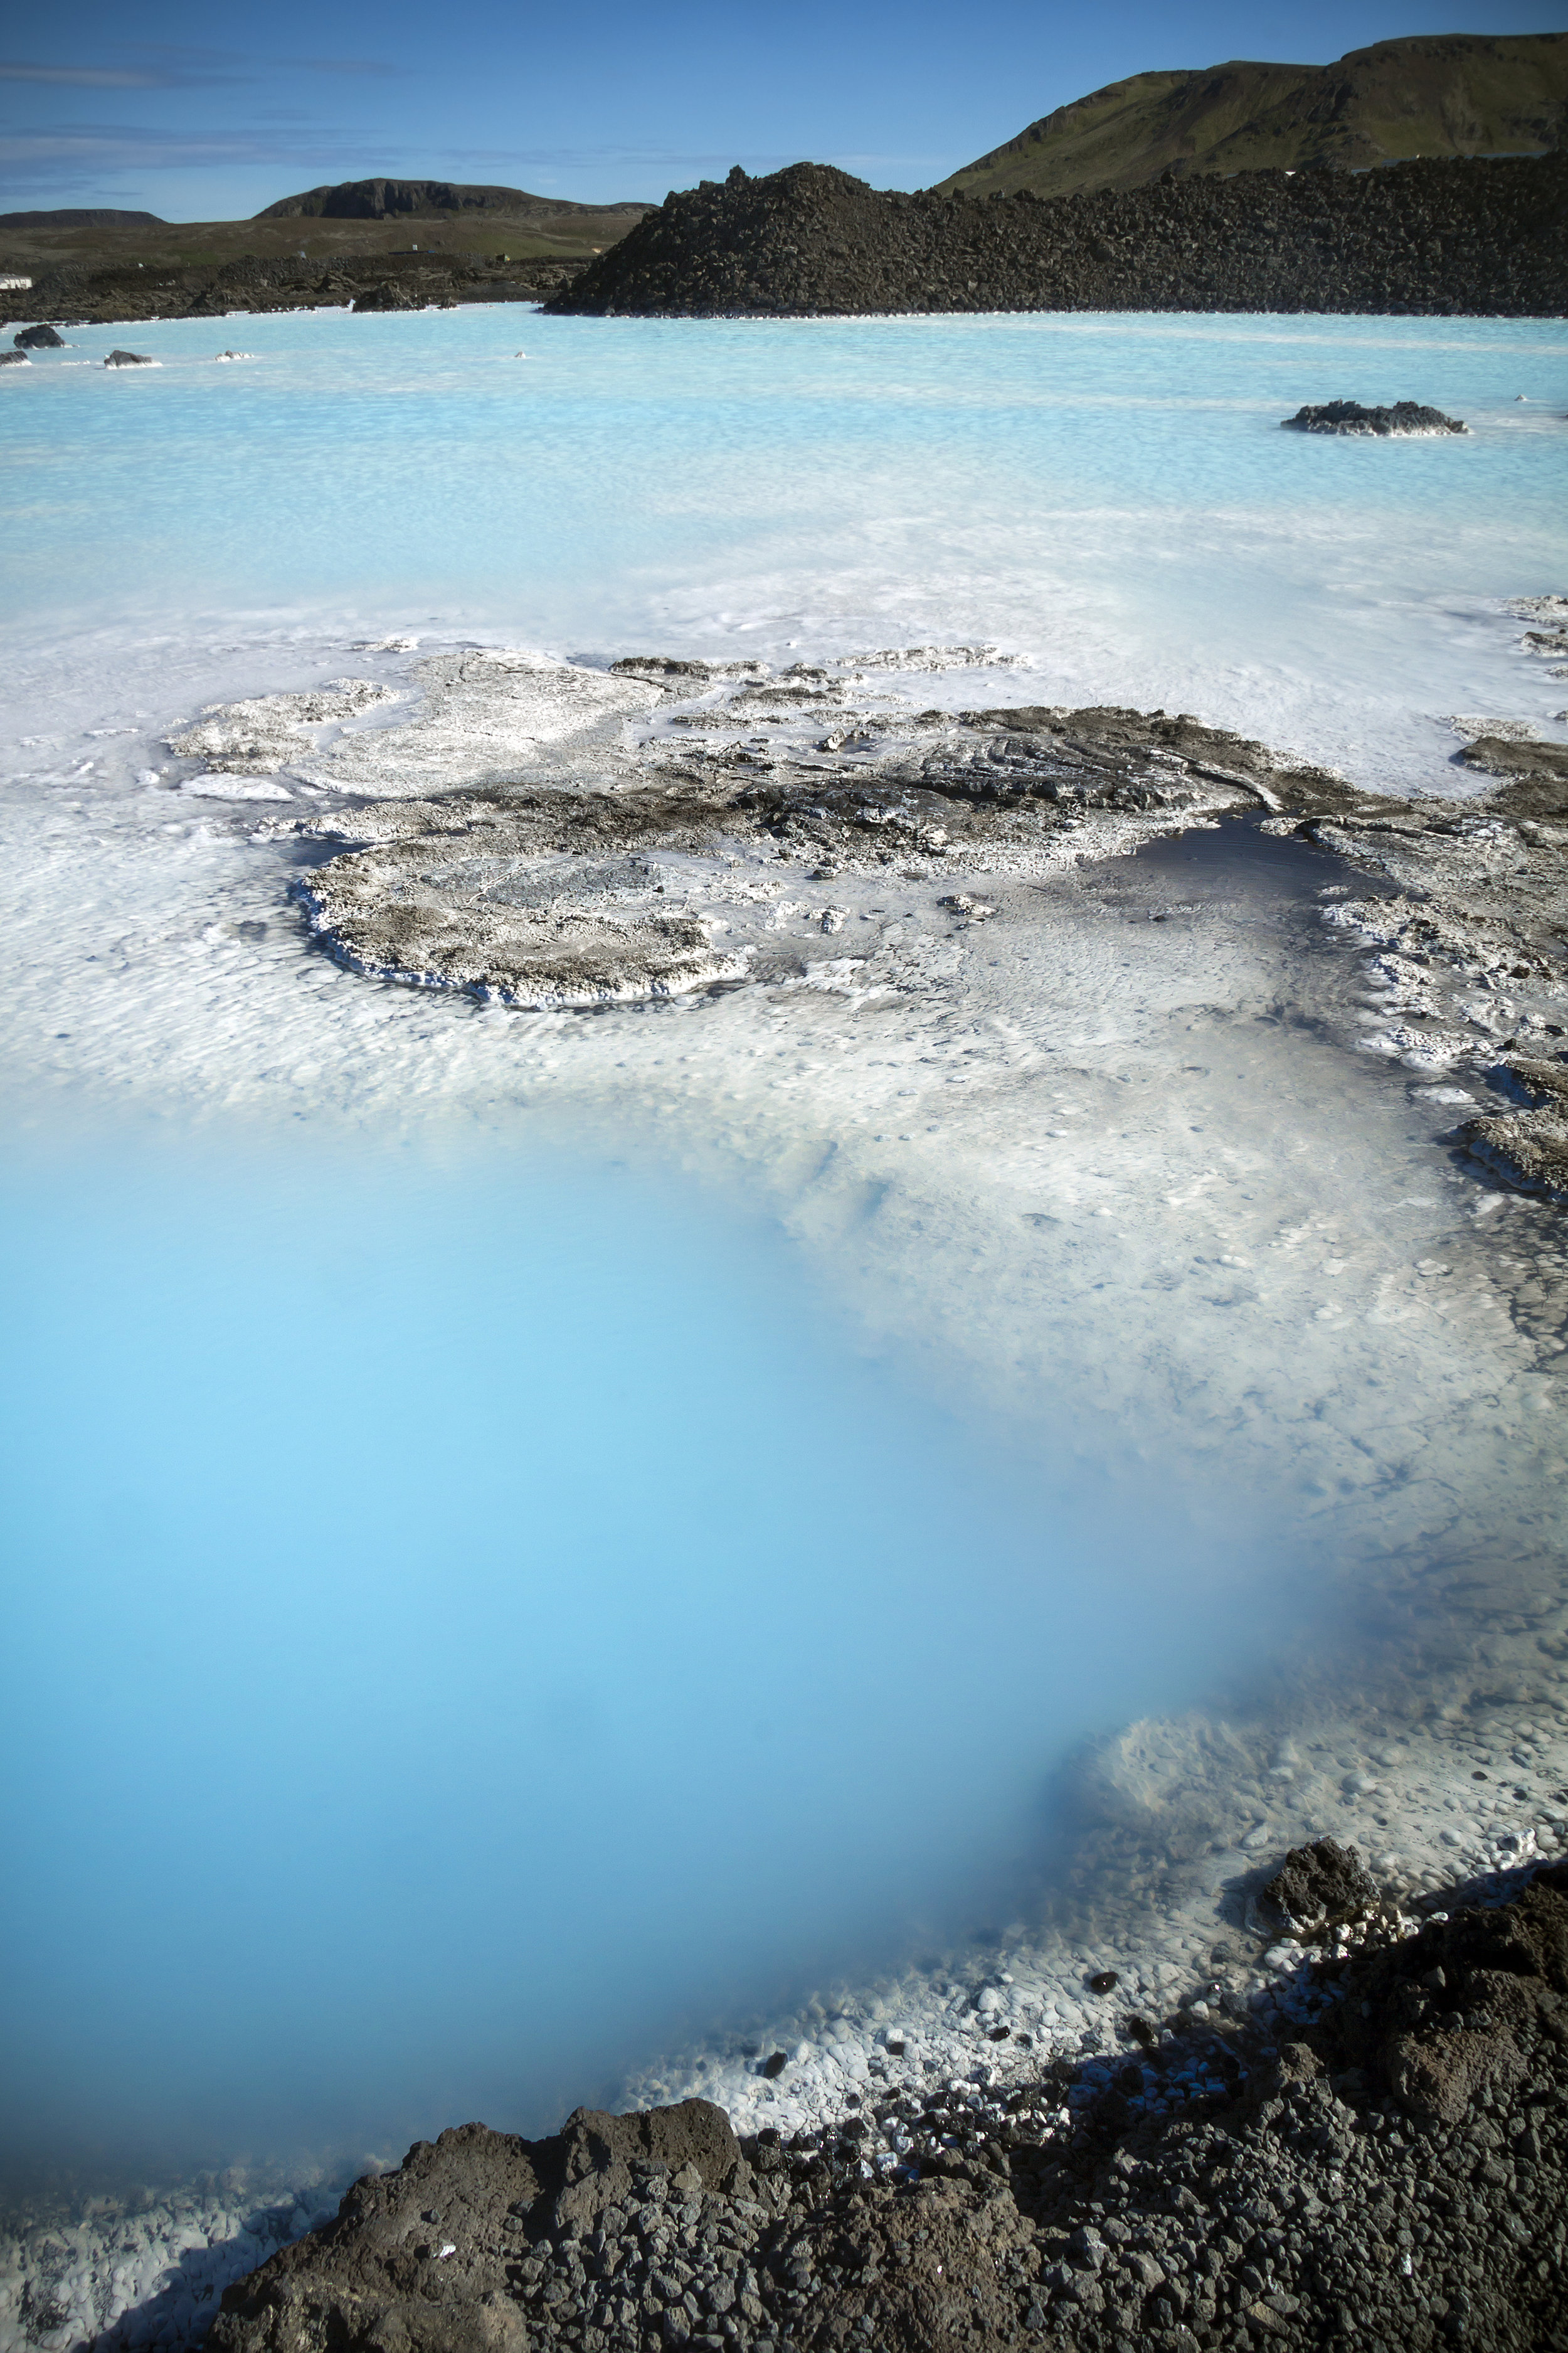 Blue Lagoon, Iceland - Visited June 2018